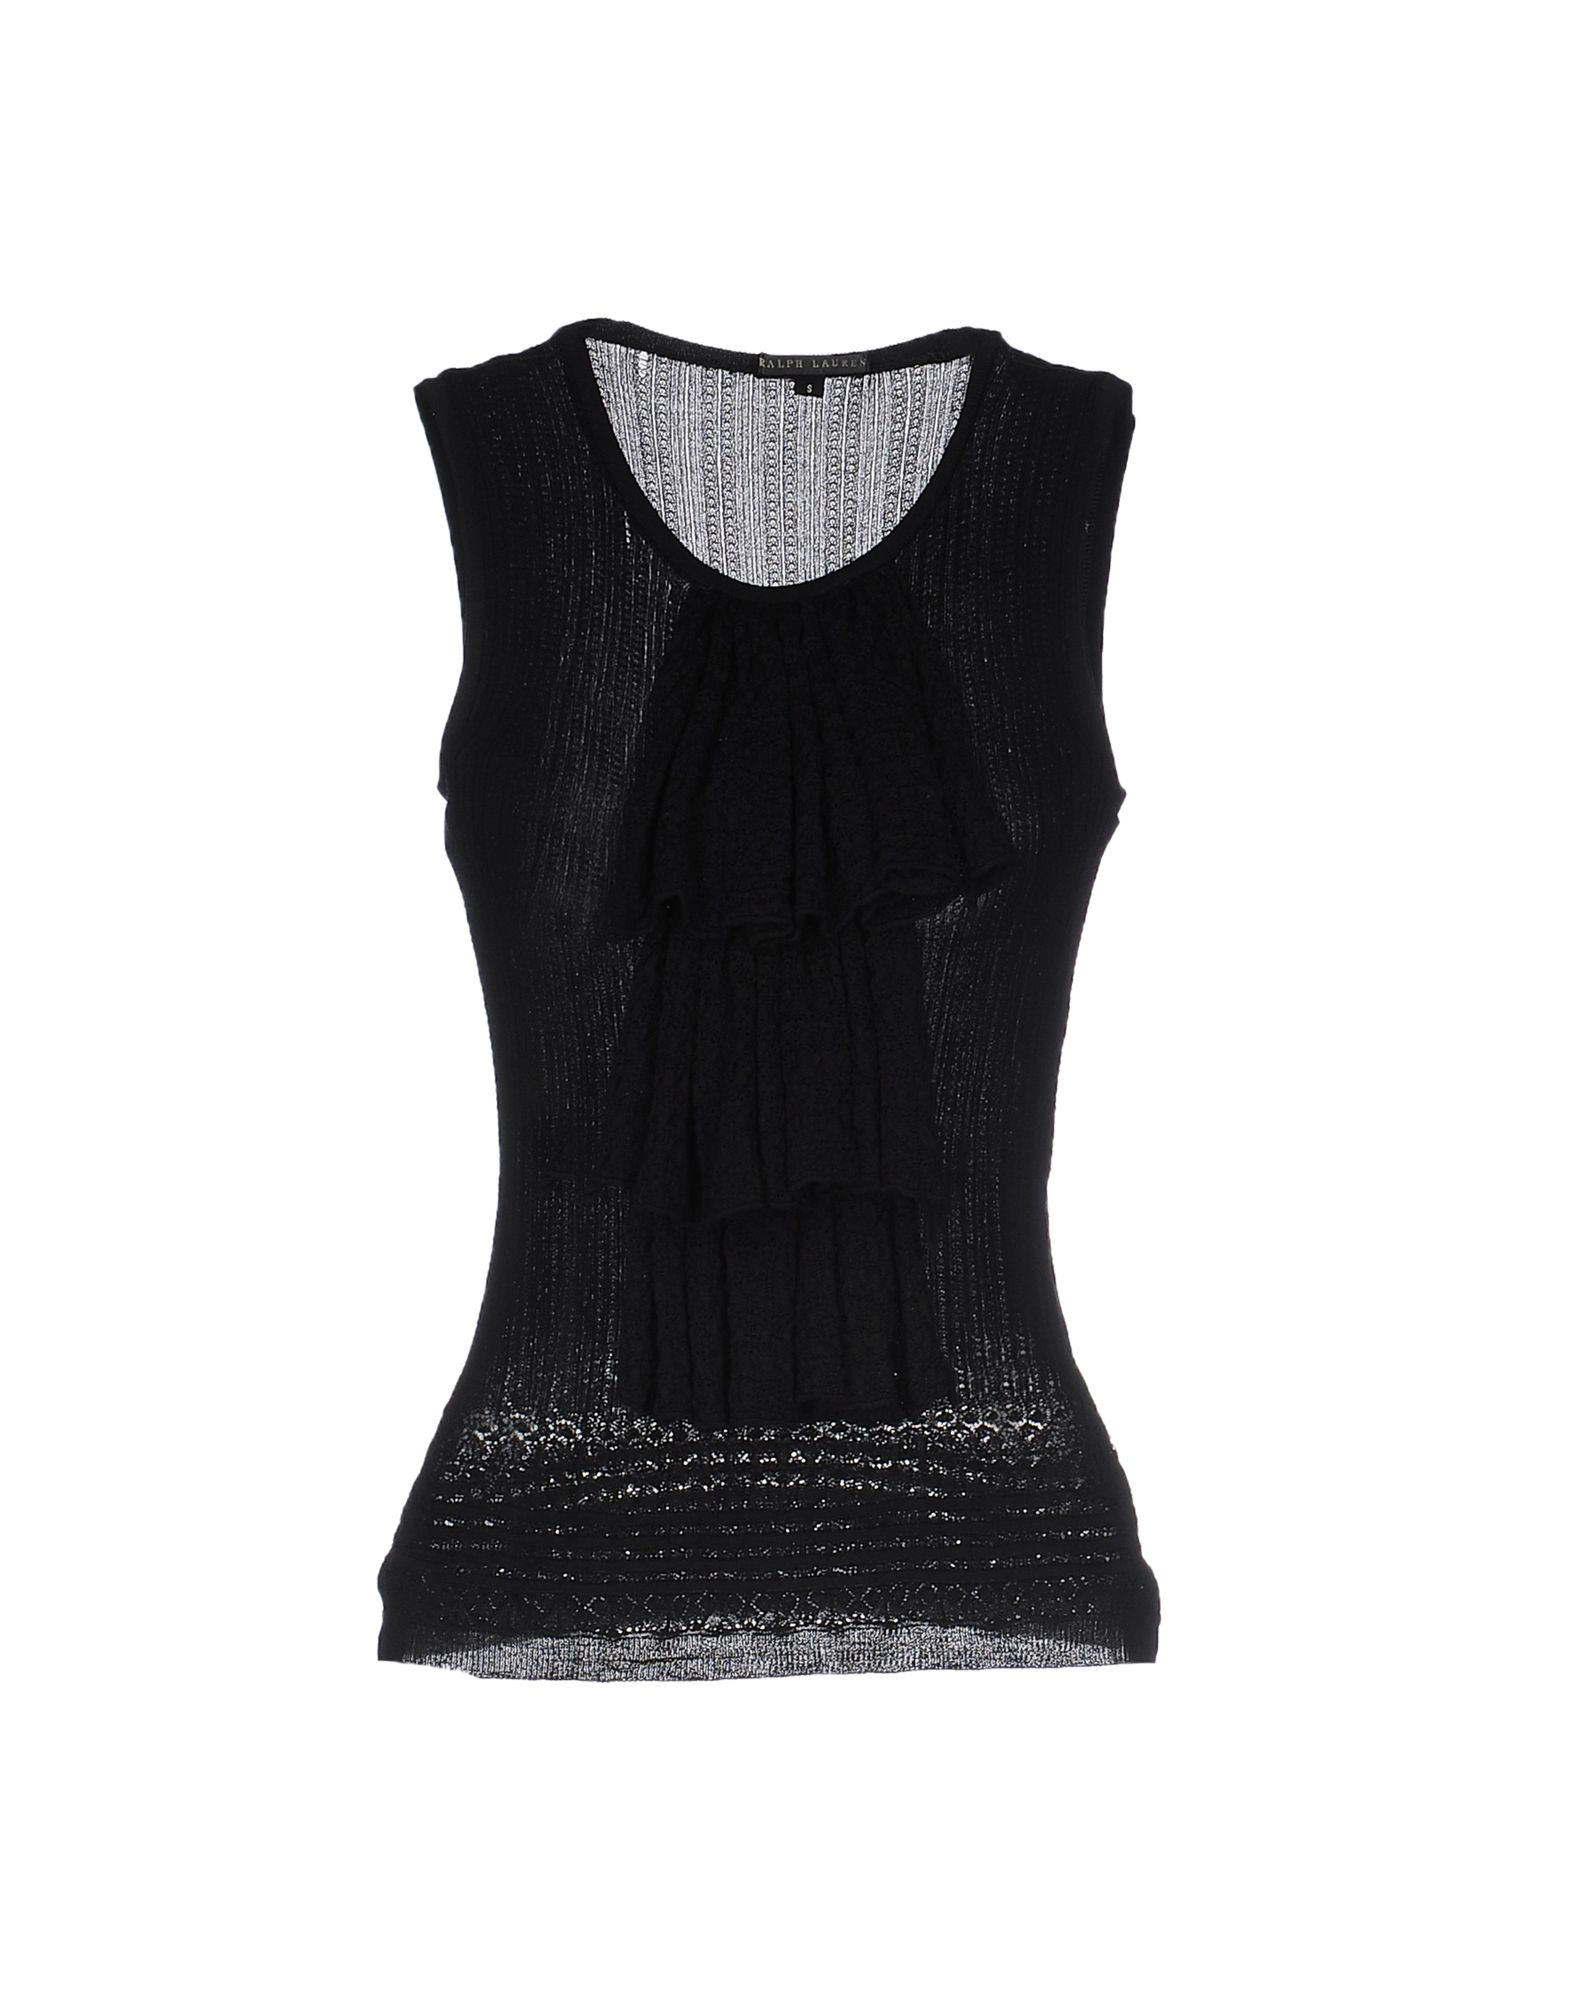 RALPH LAUREN BLACK LABEL Свитер ralph lauren black label свитер без рукавов